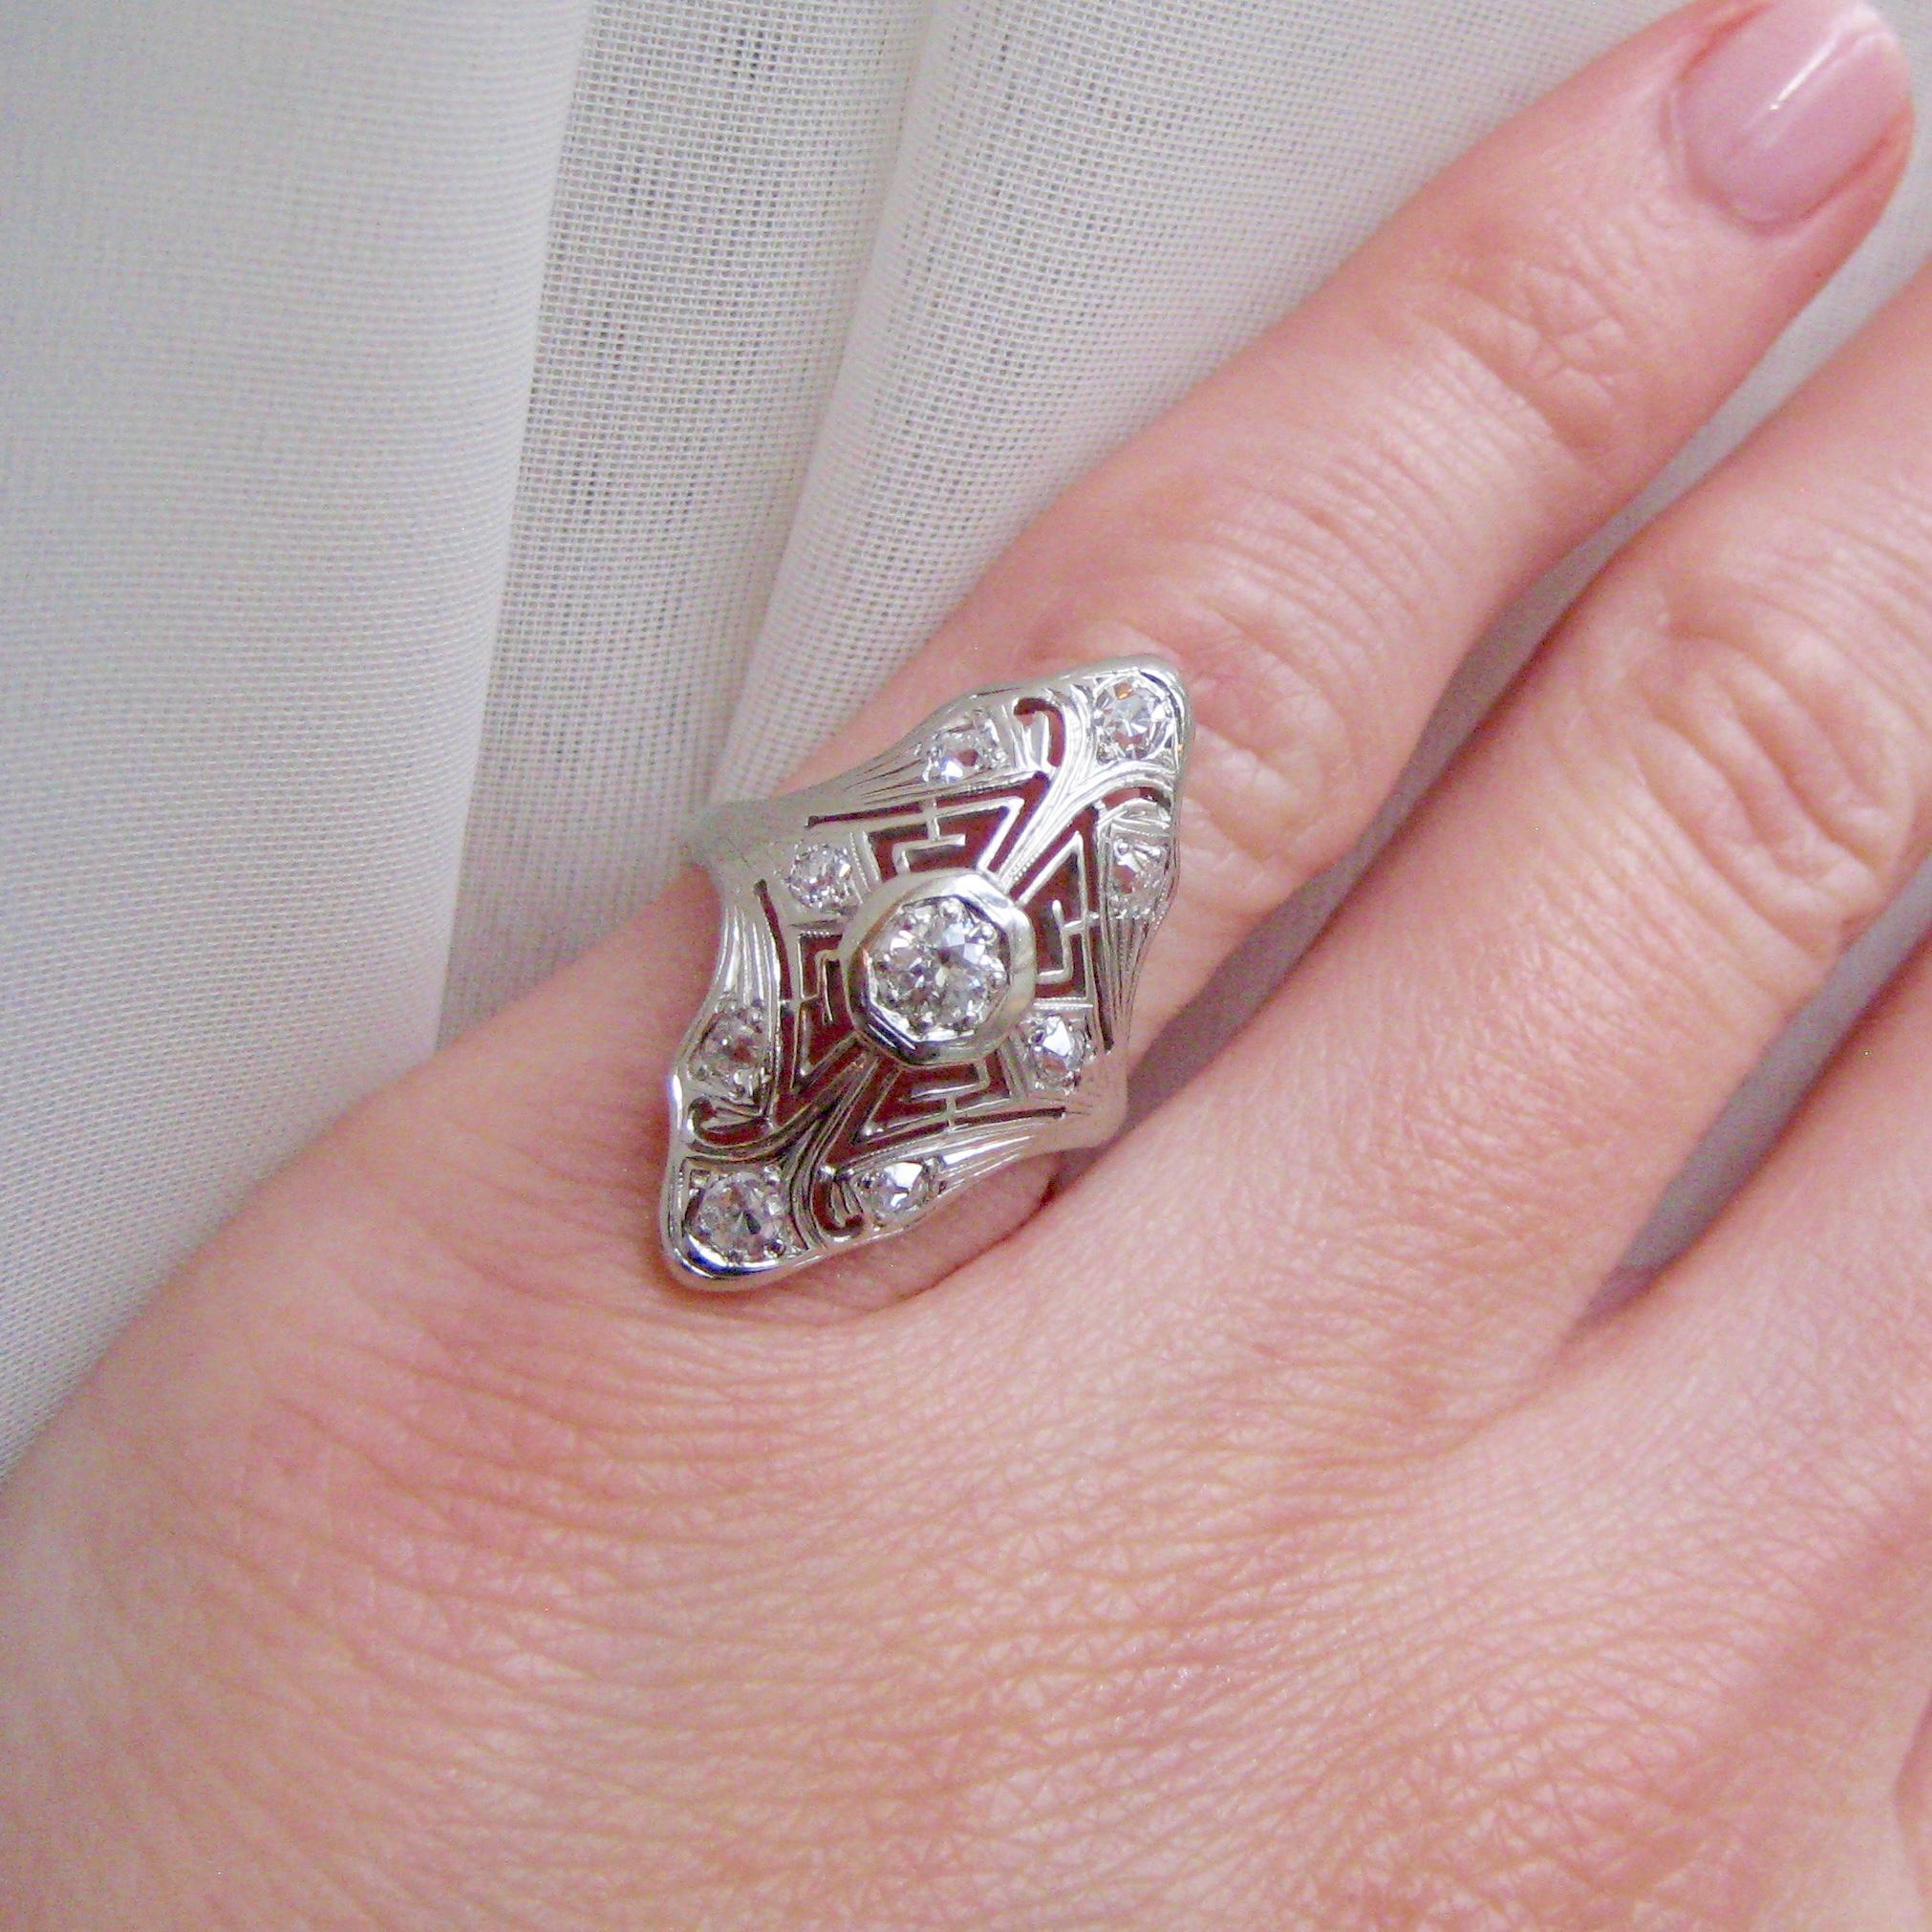 Elegant Vintage Pink Diamond Ring - Best Jewelry